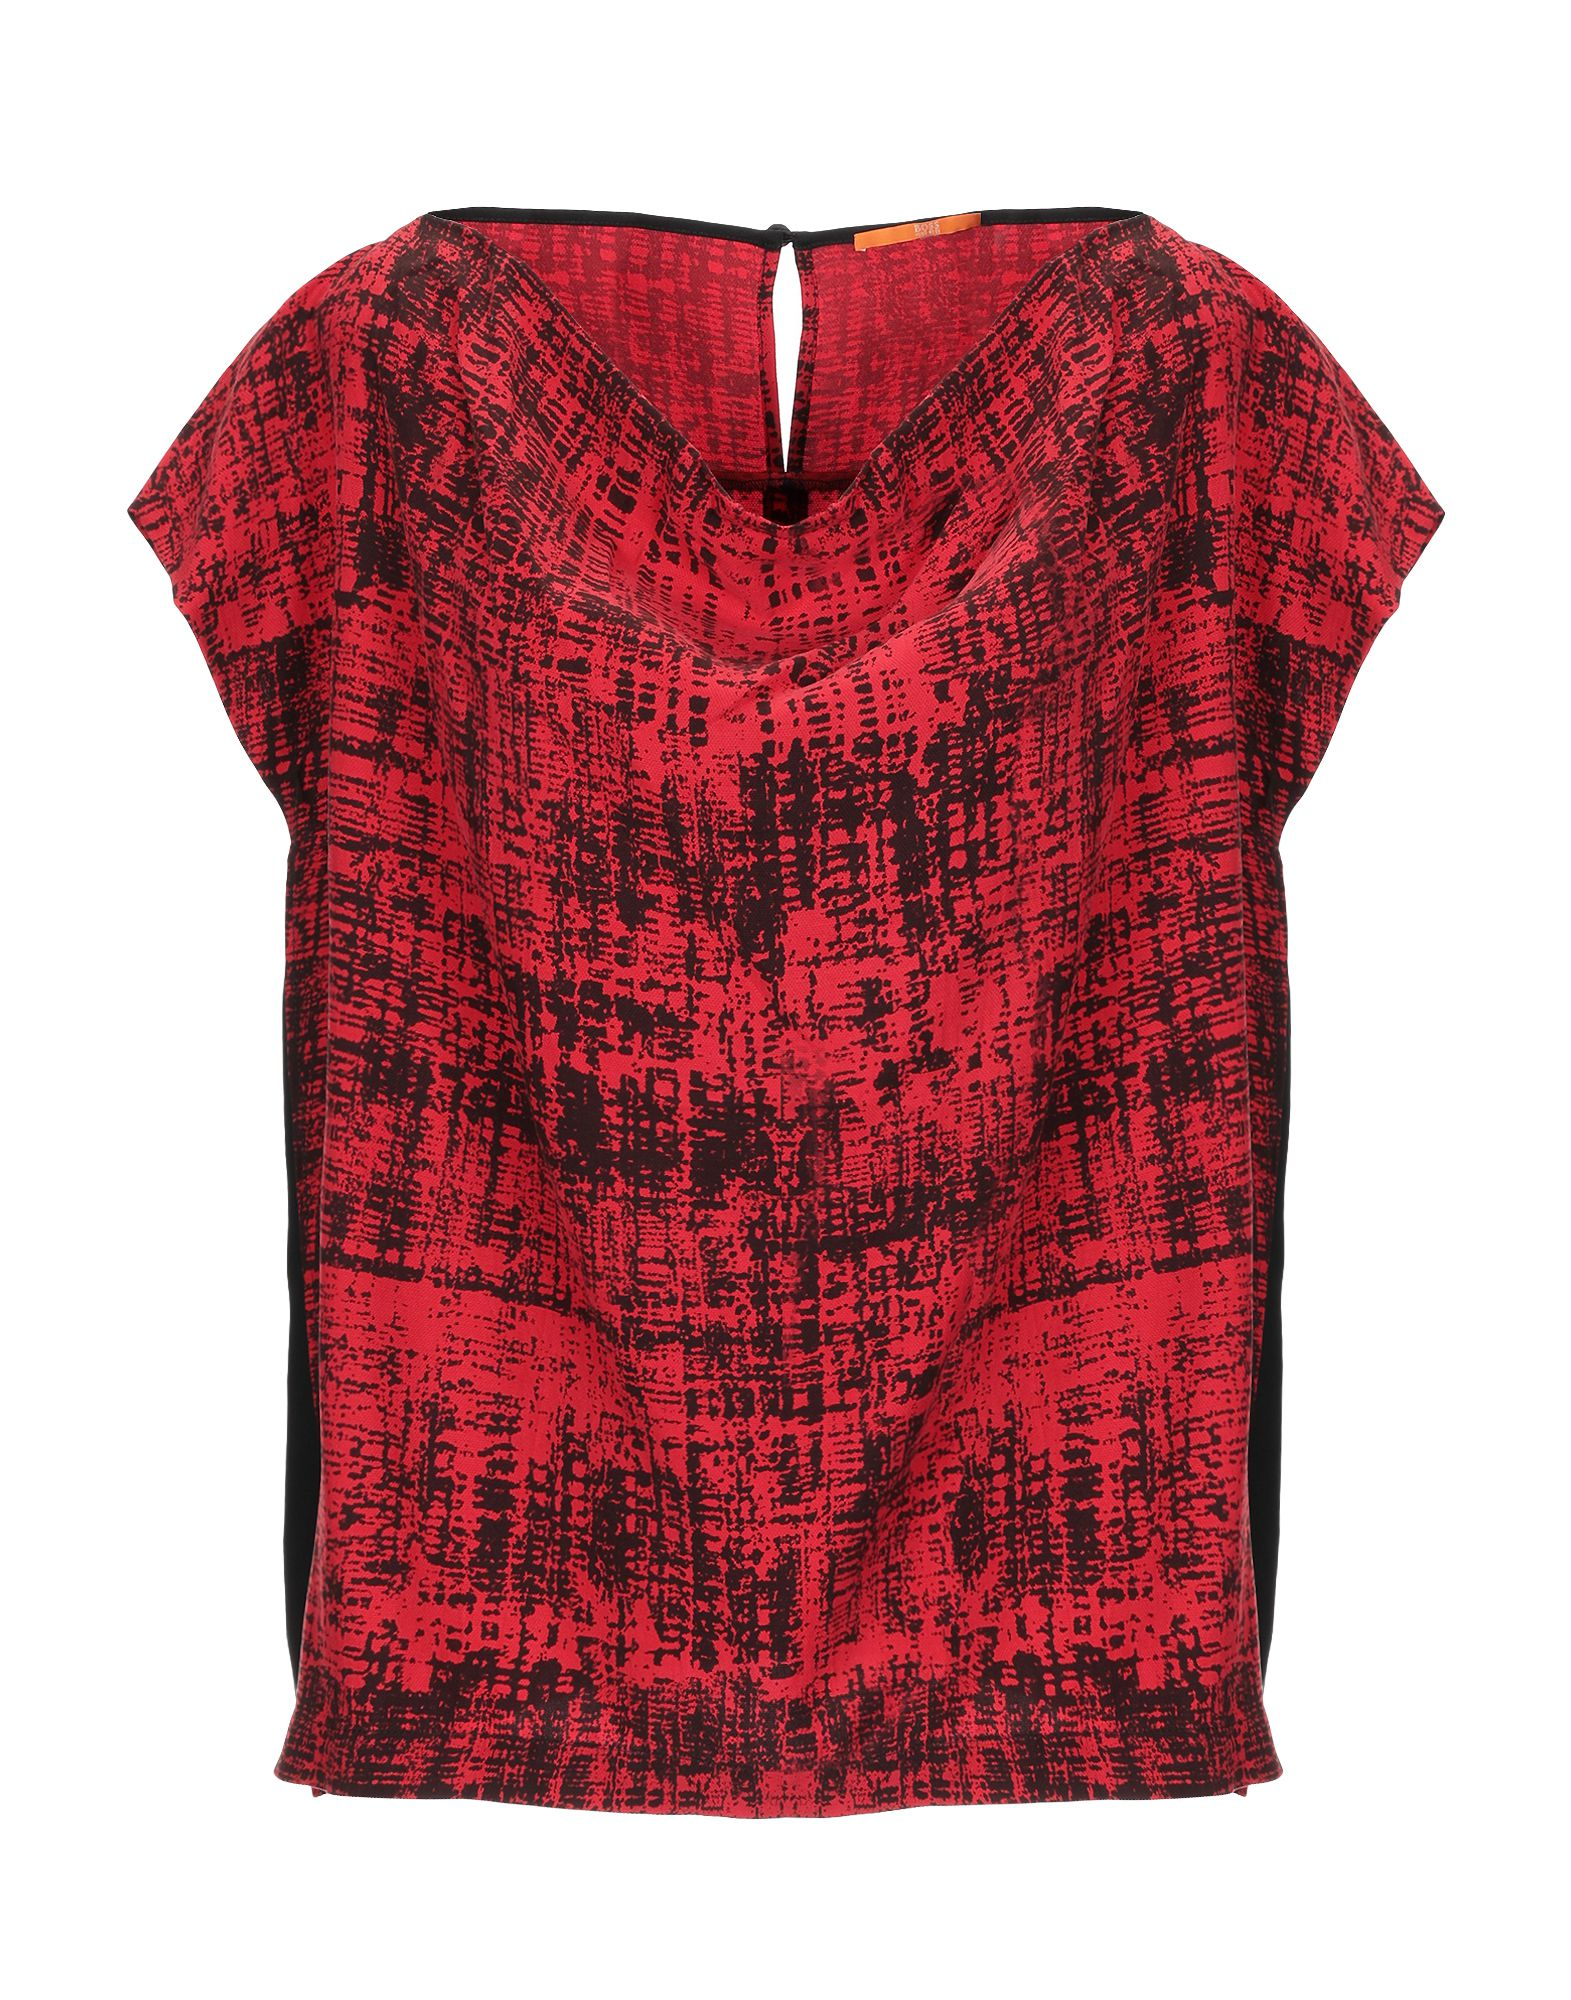 BOSS ORANGE Блузка блузка с рисунком короткие рукава вырез сзади